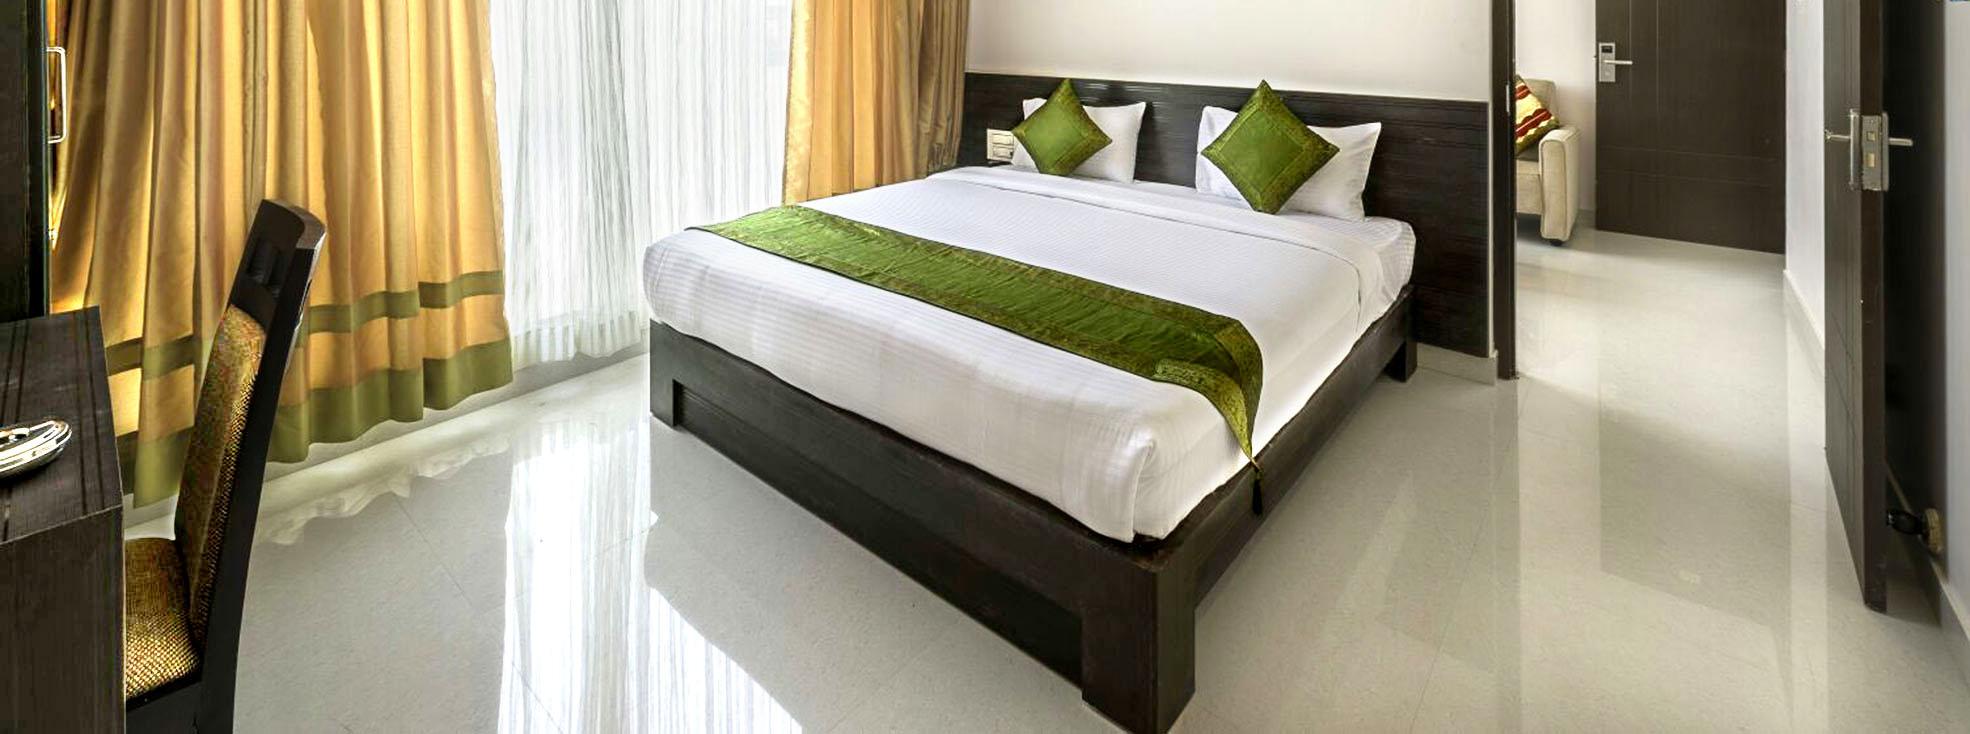 https://www.ogabnb.com/images/hotels/zzaosgf02f9xij7syel0.jpg